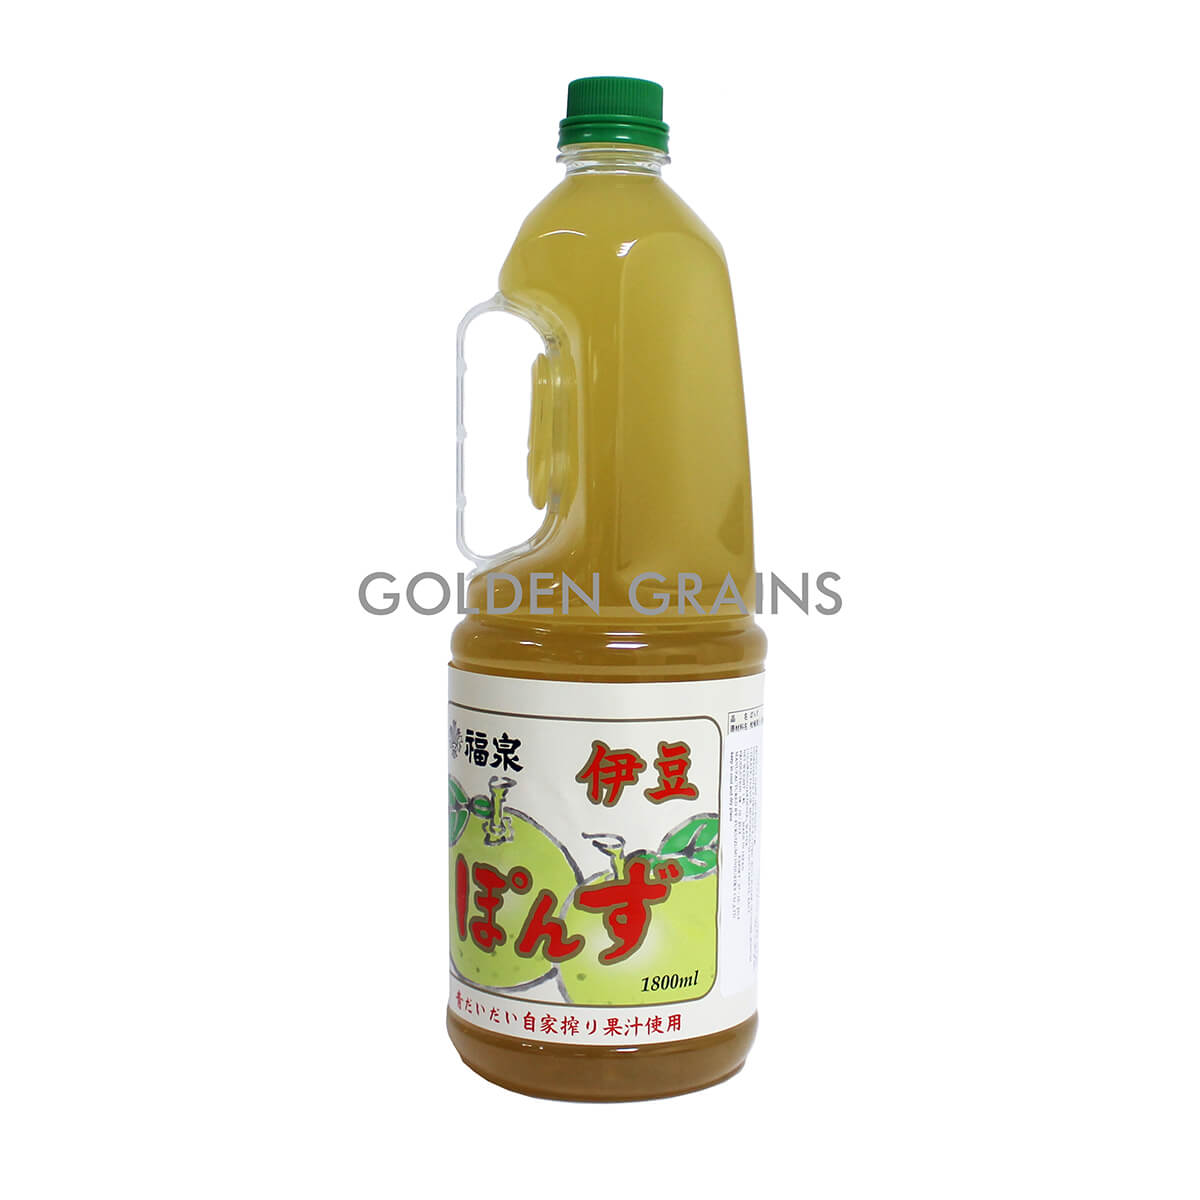 Golden Grains Fukuizumi - Ponzu Japanese Citrus - 1.8LTR - Front.jpg